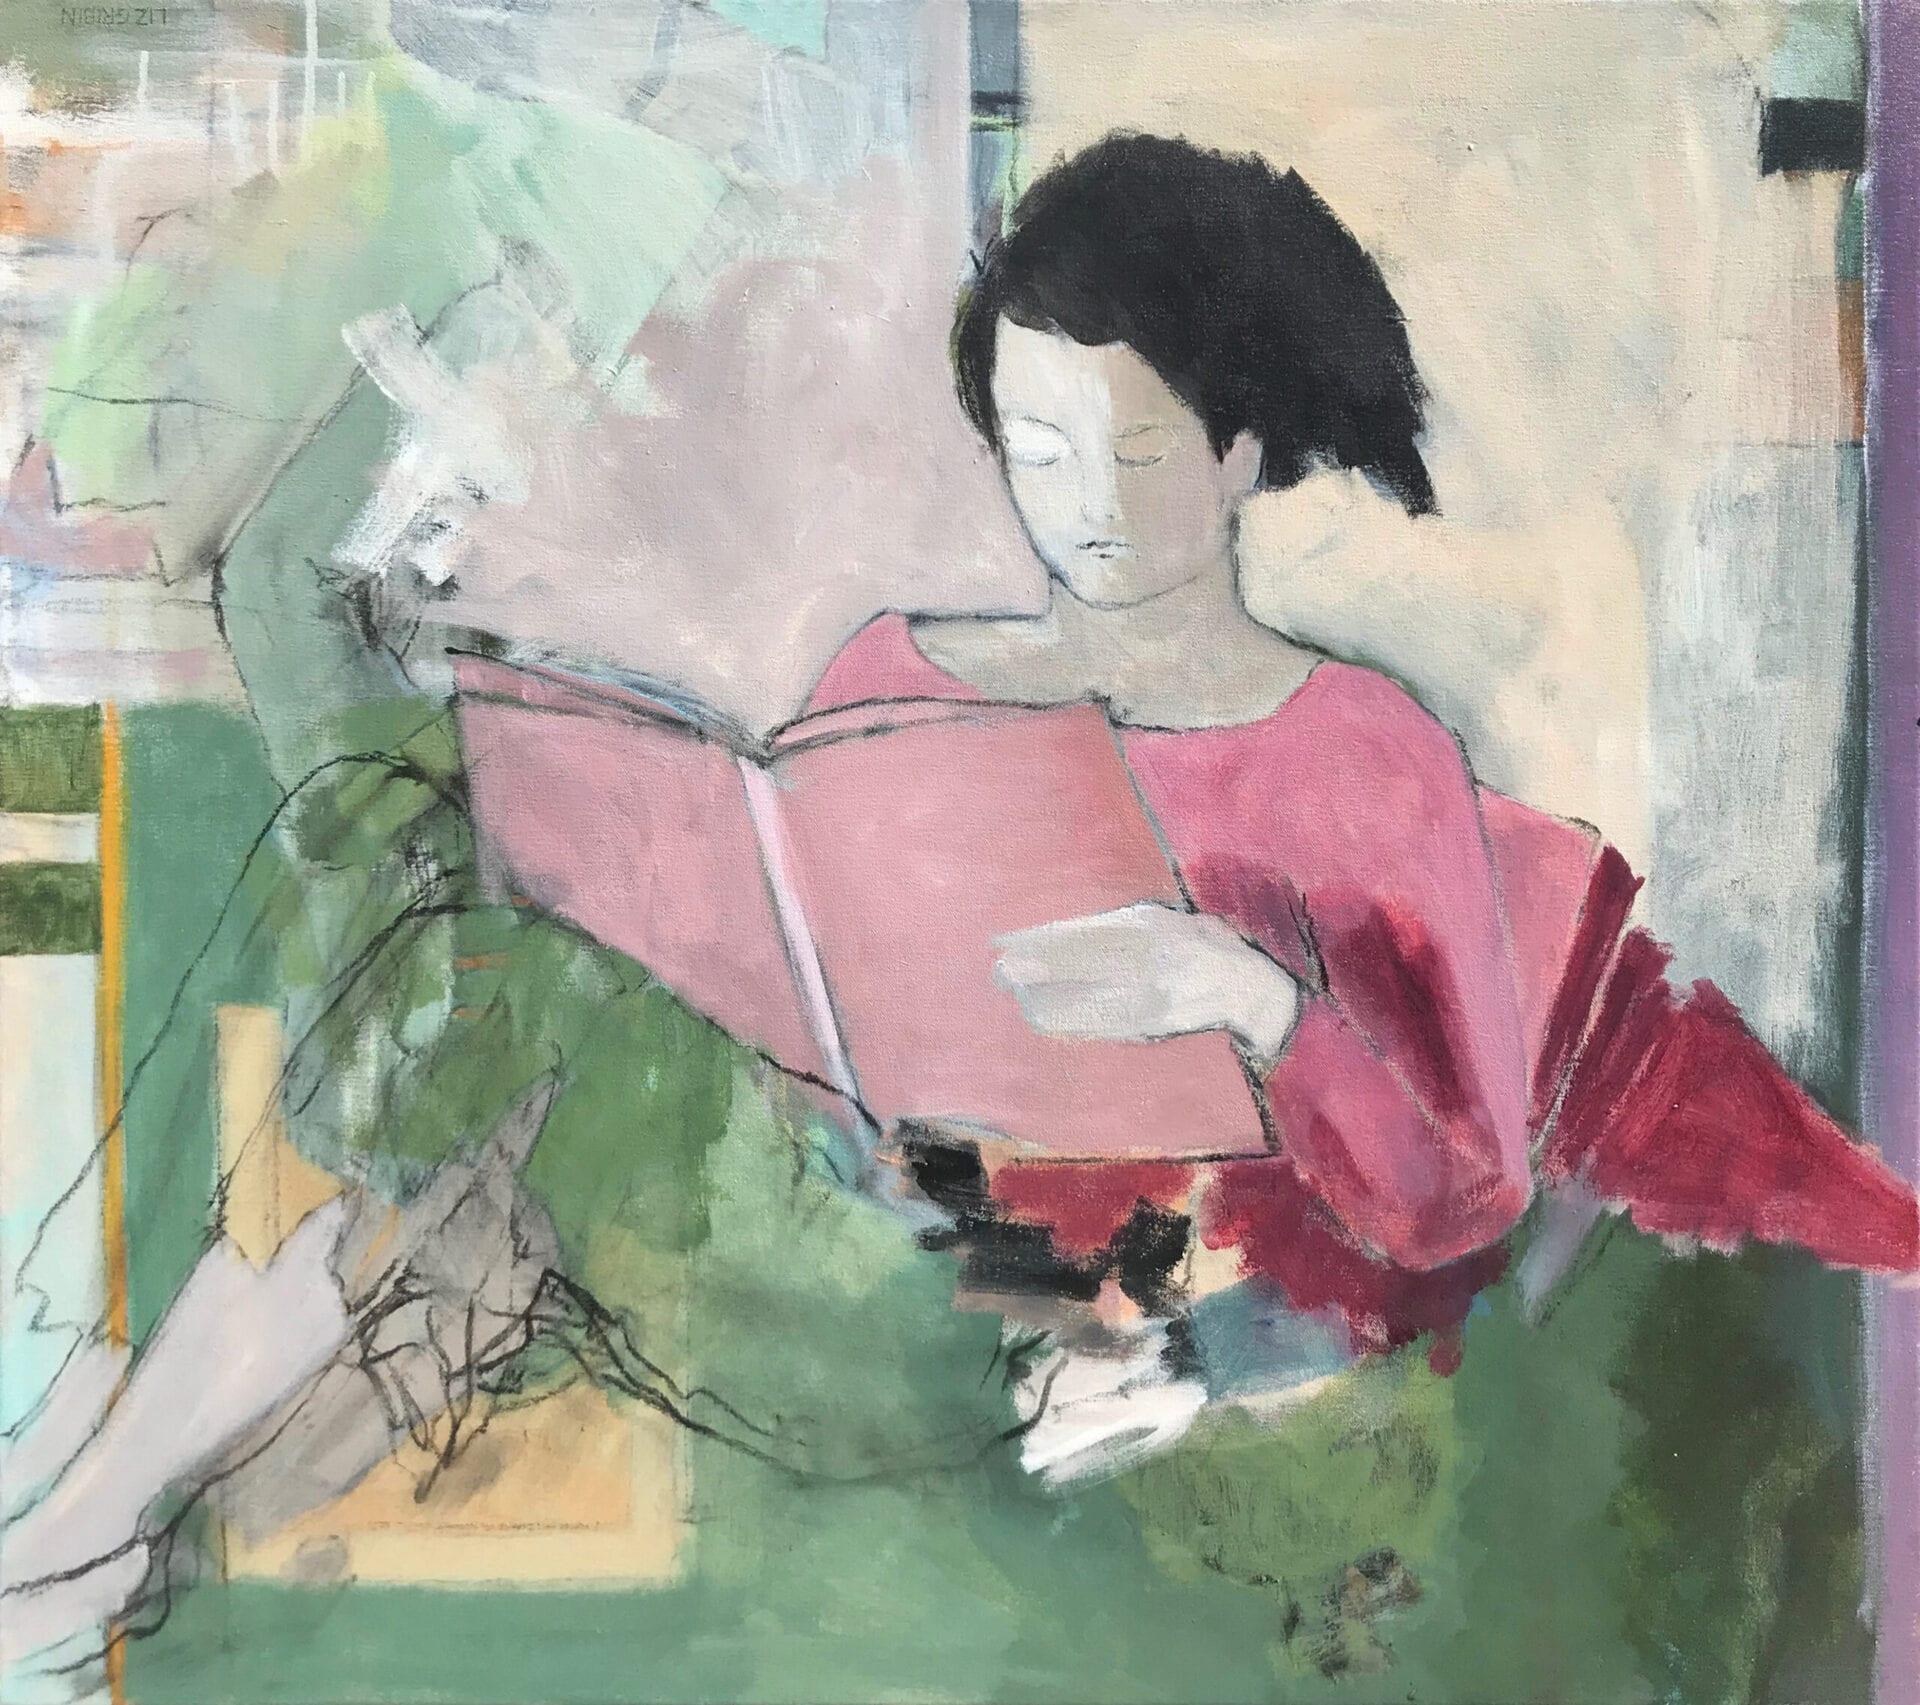 Liz Gribin - Denouement